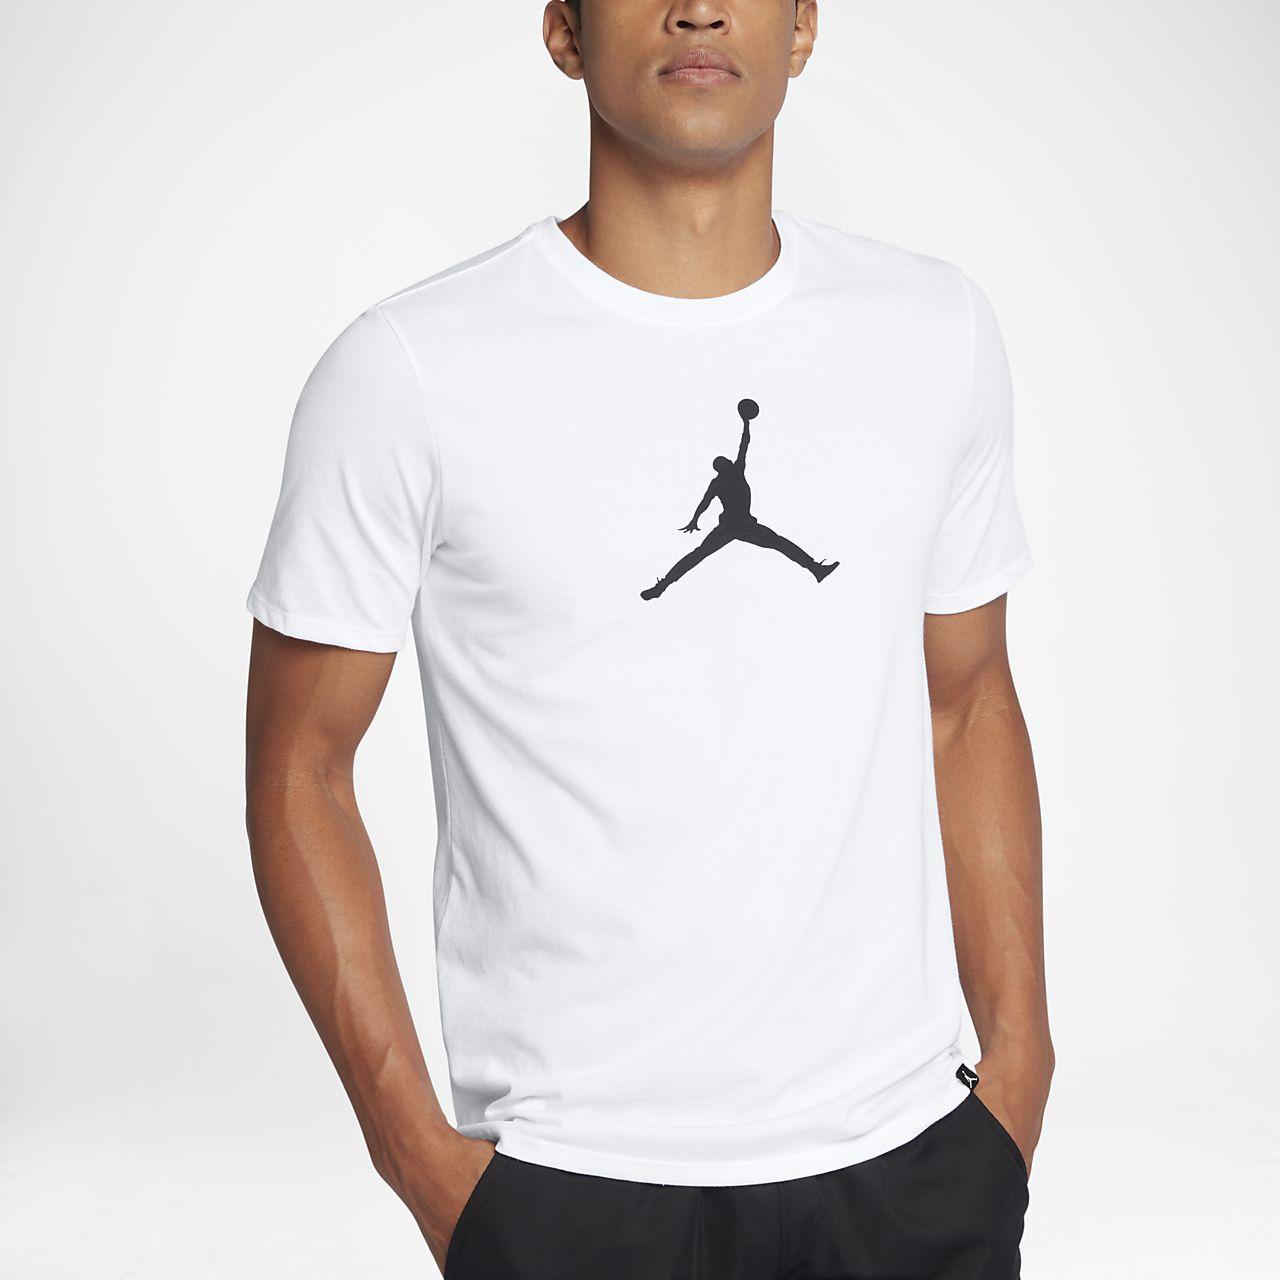 ... Jordan Dri-FIT JMTC 23/7 Jumpman Men's T-Shirt